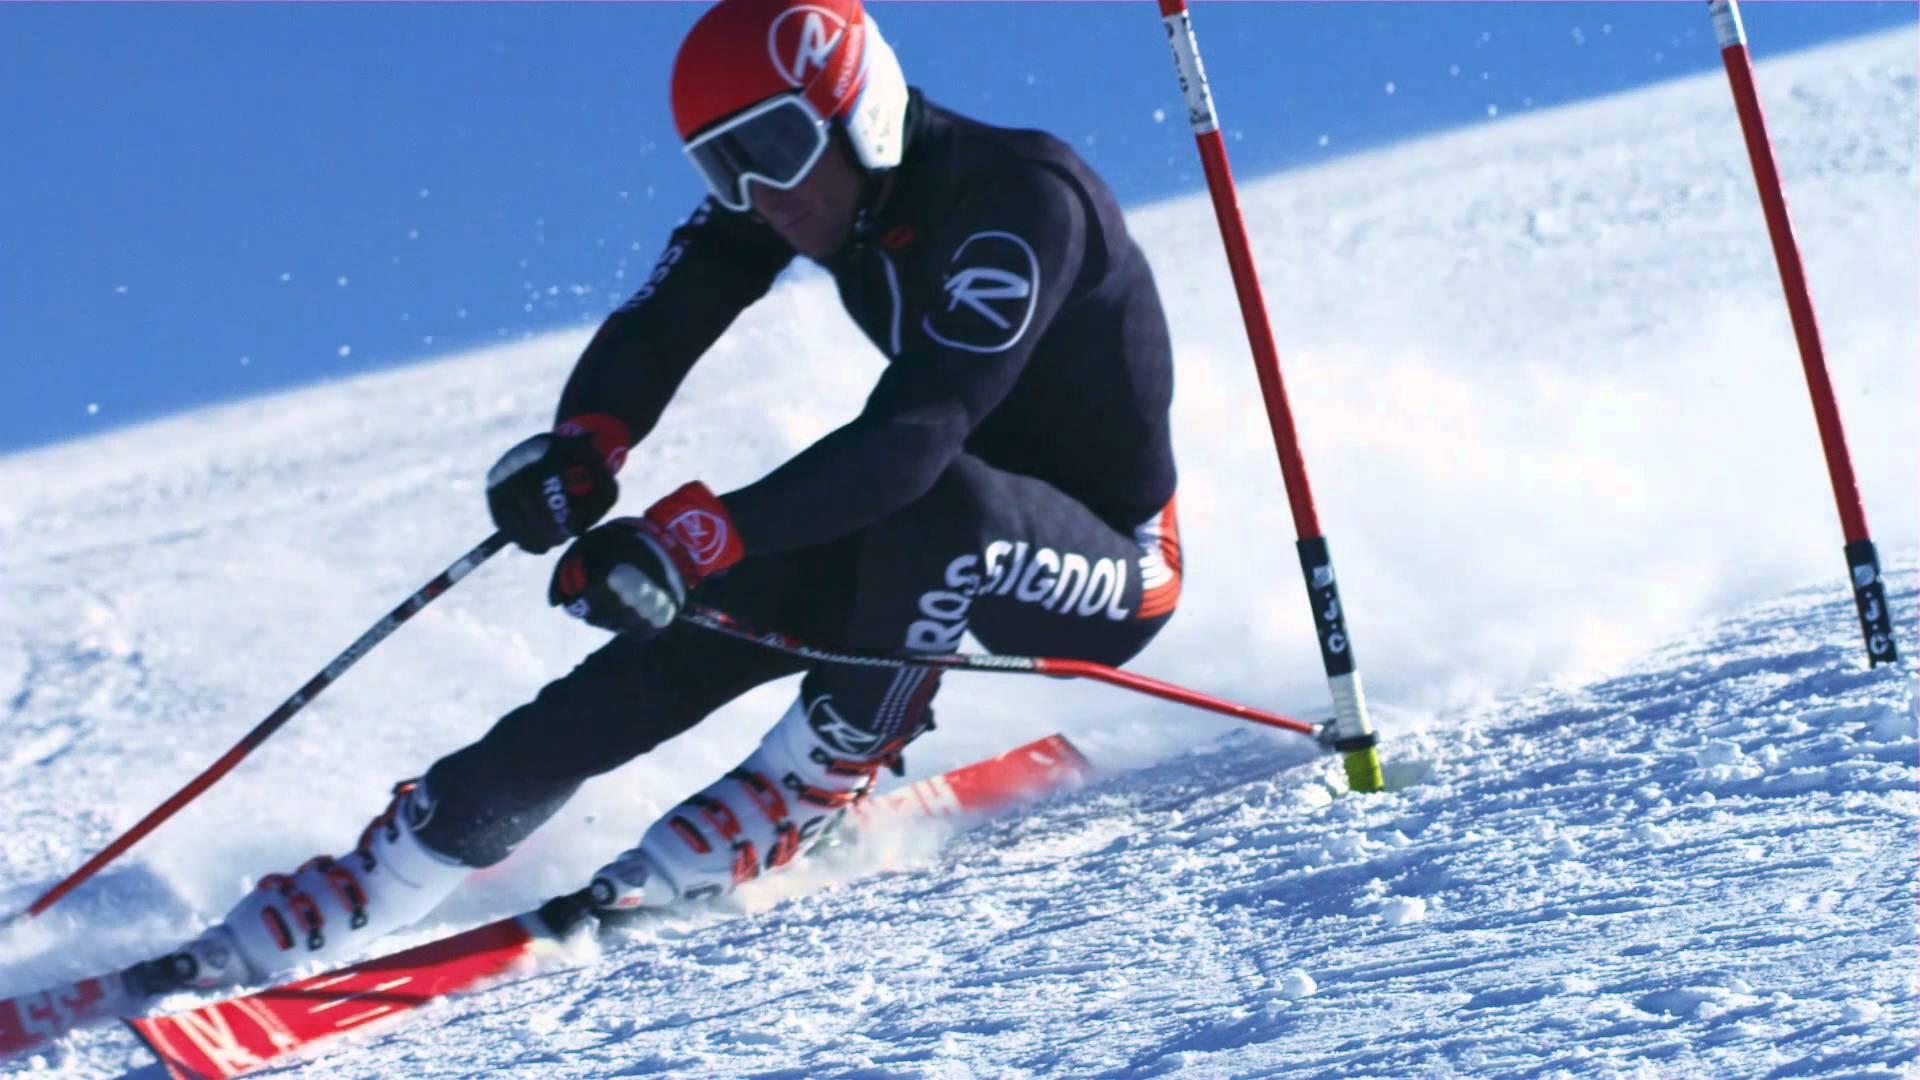 Kurs na instruktora narciarstwa